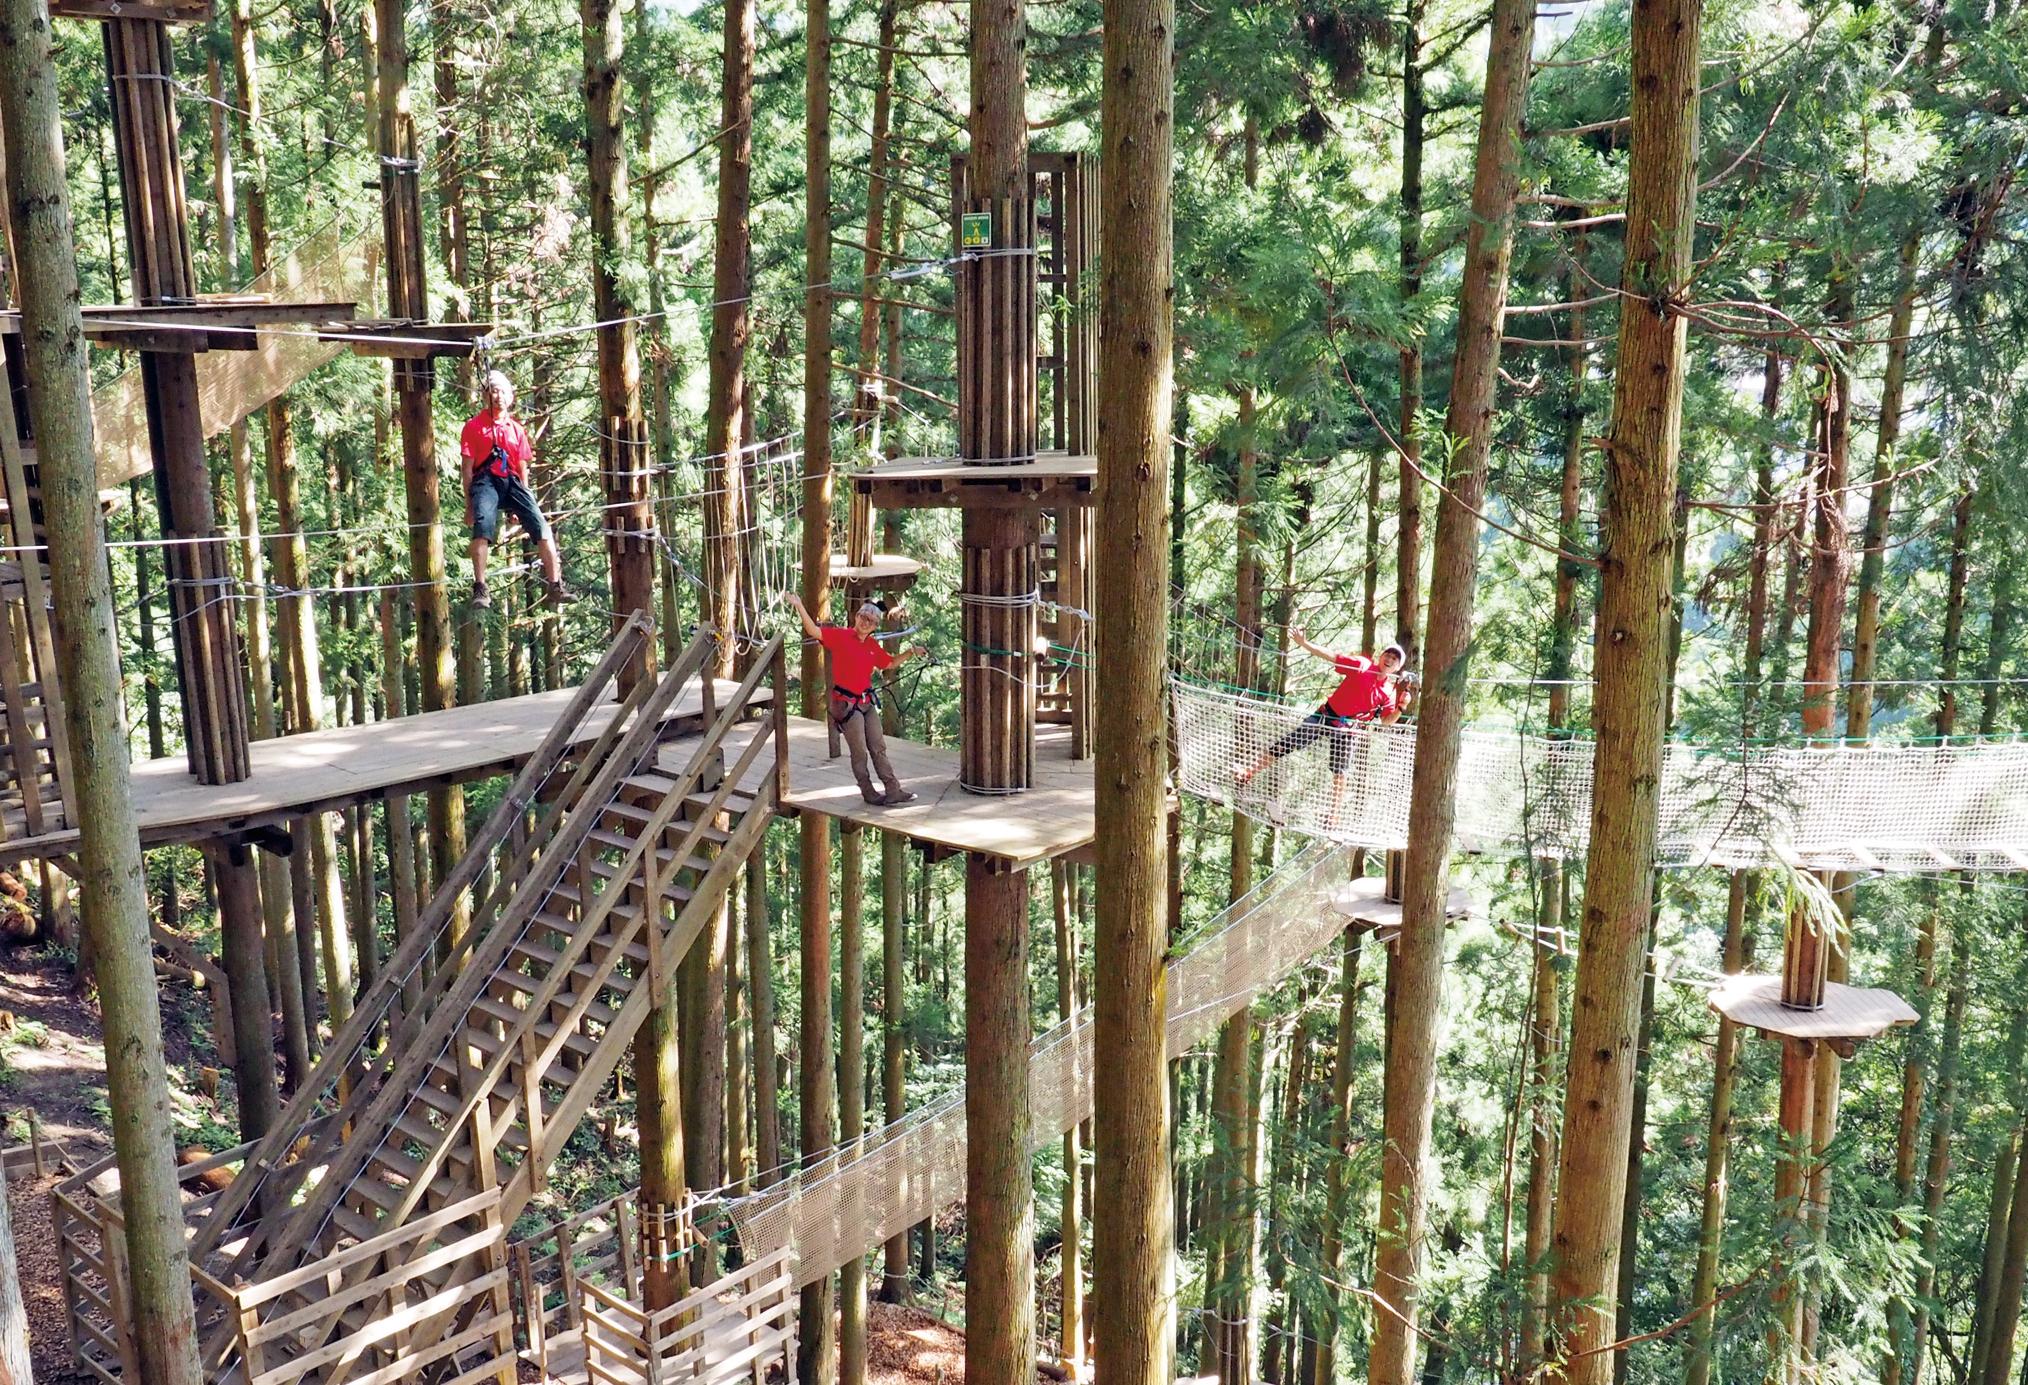 TOKUSHIMAのアウトドア&レジャー3選。スリル&アクティブ&エンジョイ! 徳島にこんな楽しいトコロ、あったんだ!! 大自然で遊びまくろう♪